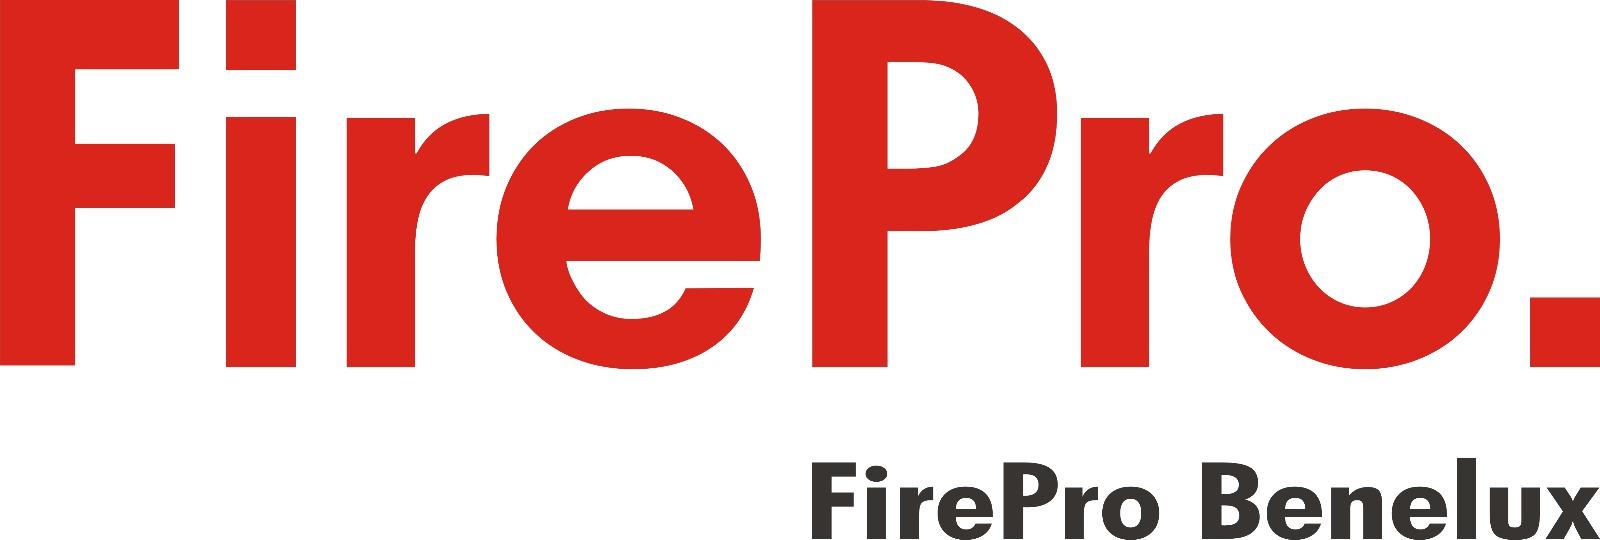 Firepro Benelux